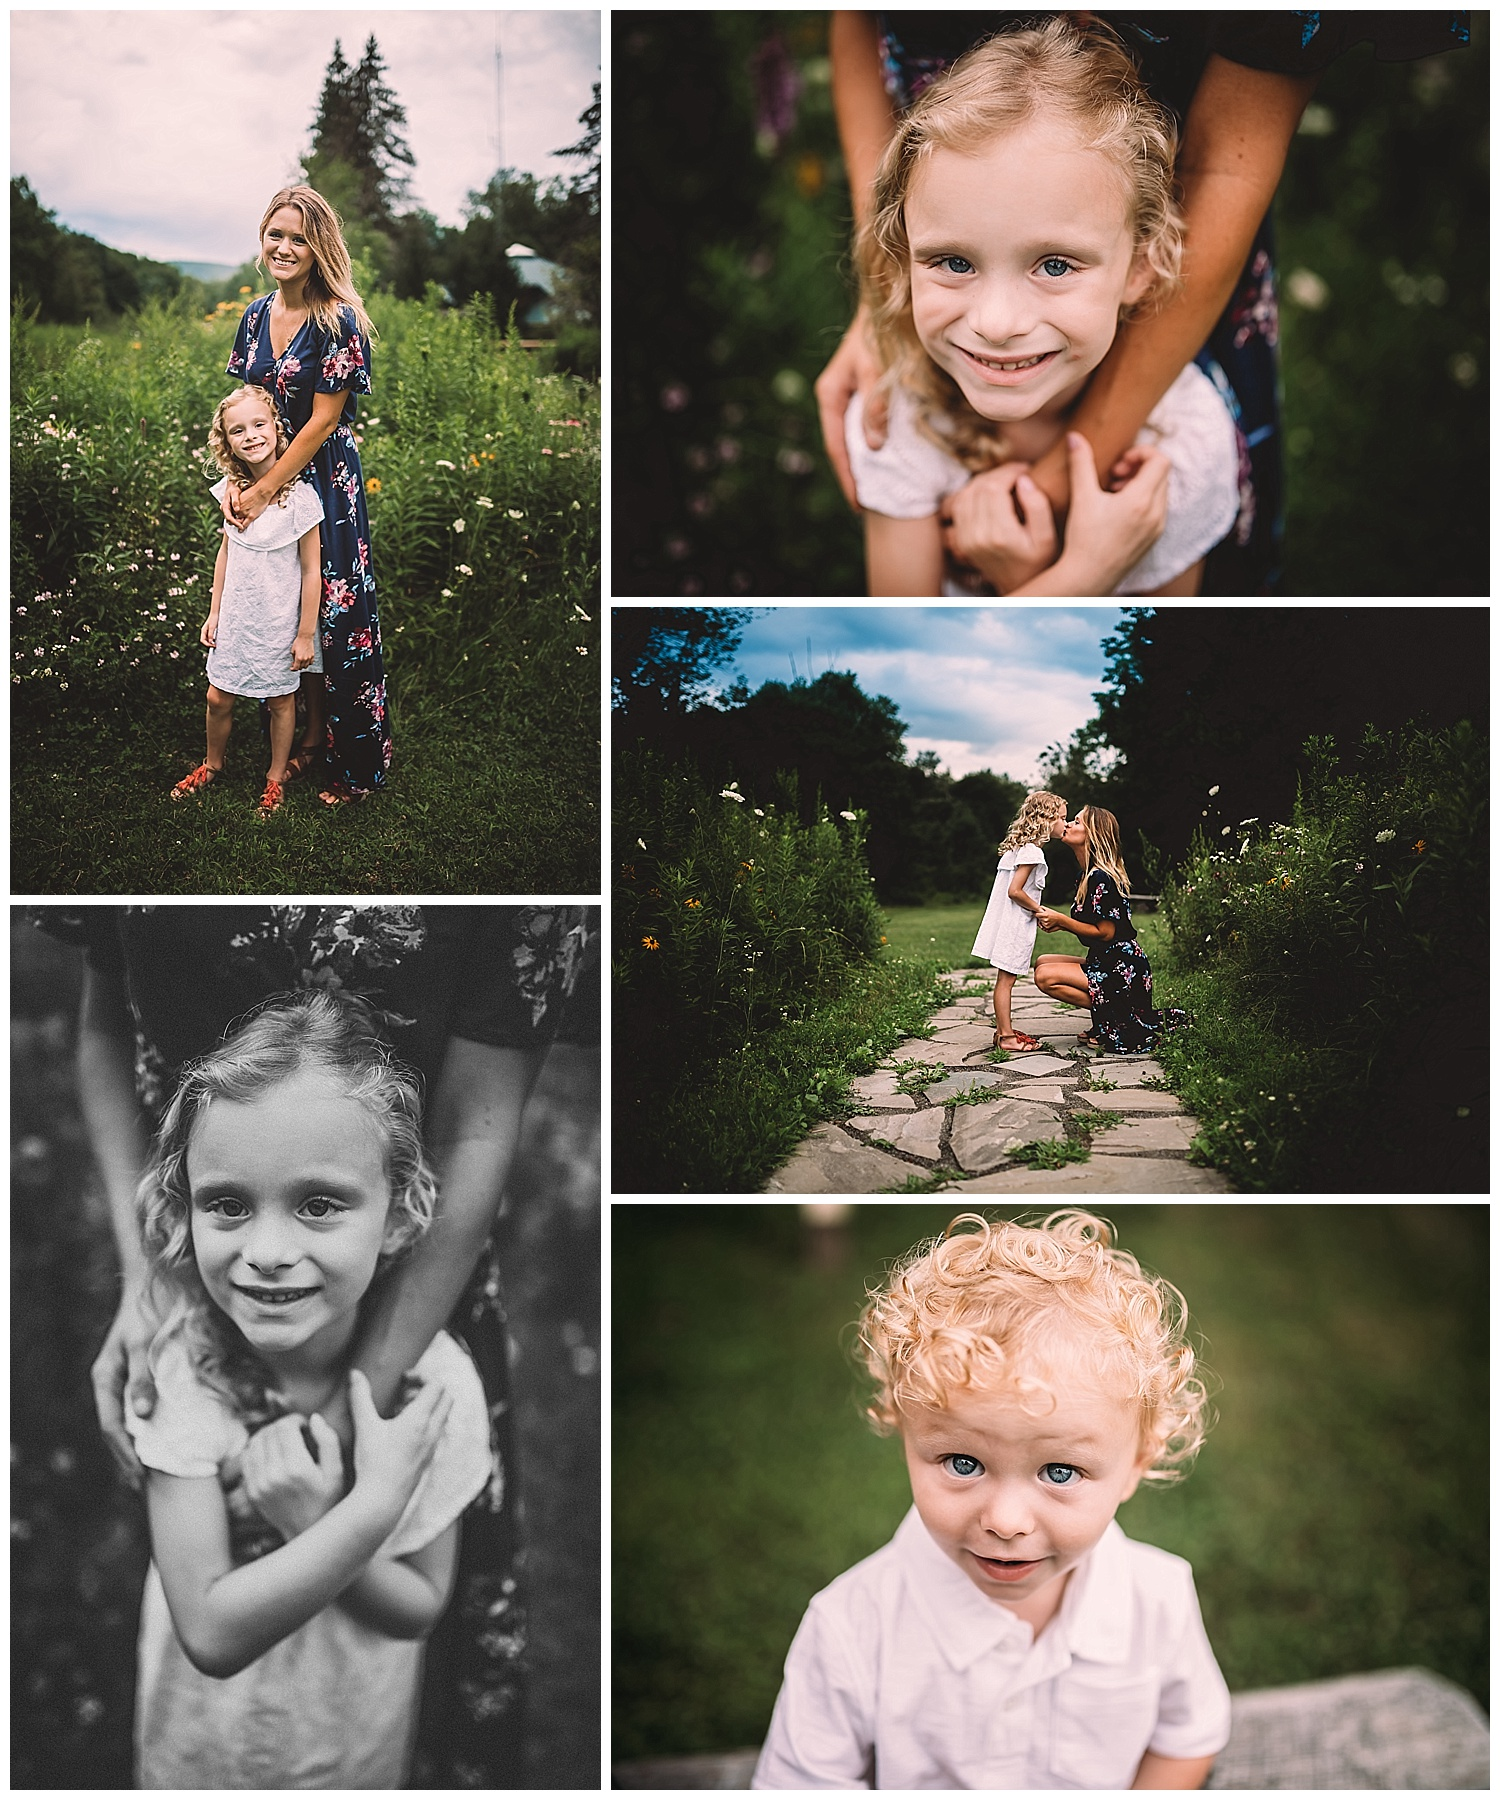 NEPA Family Photographer in Lewisburg, Pennsylvania